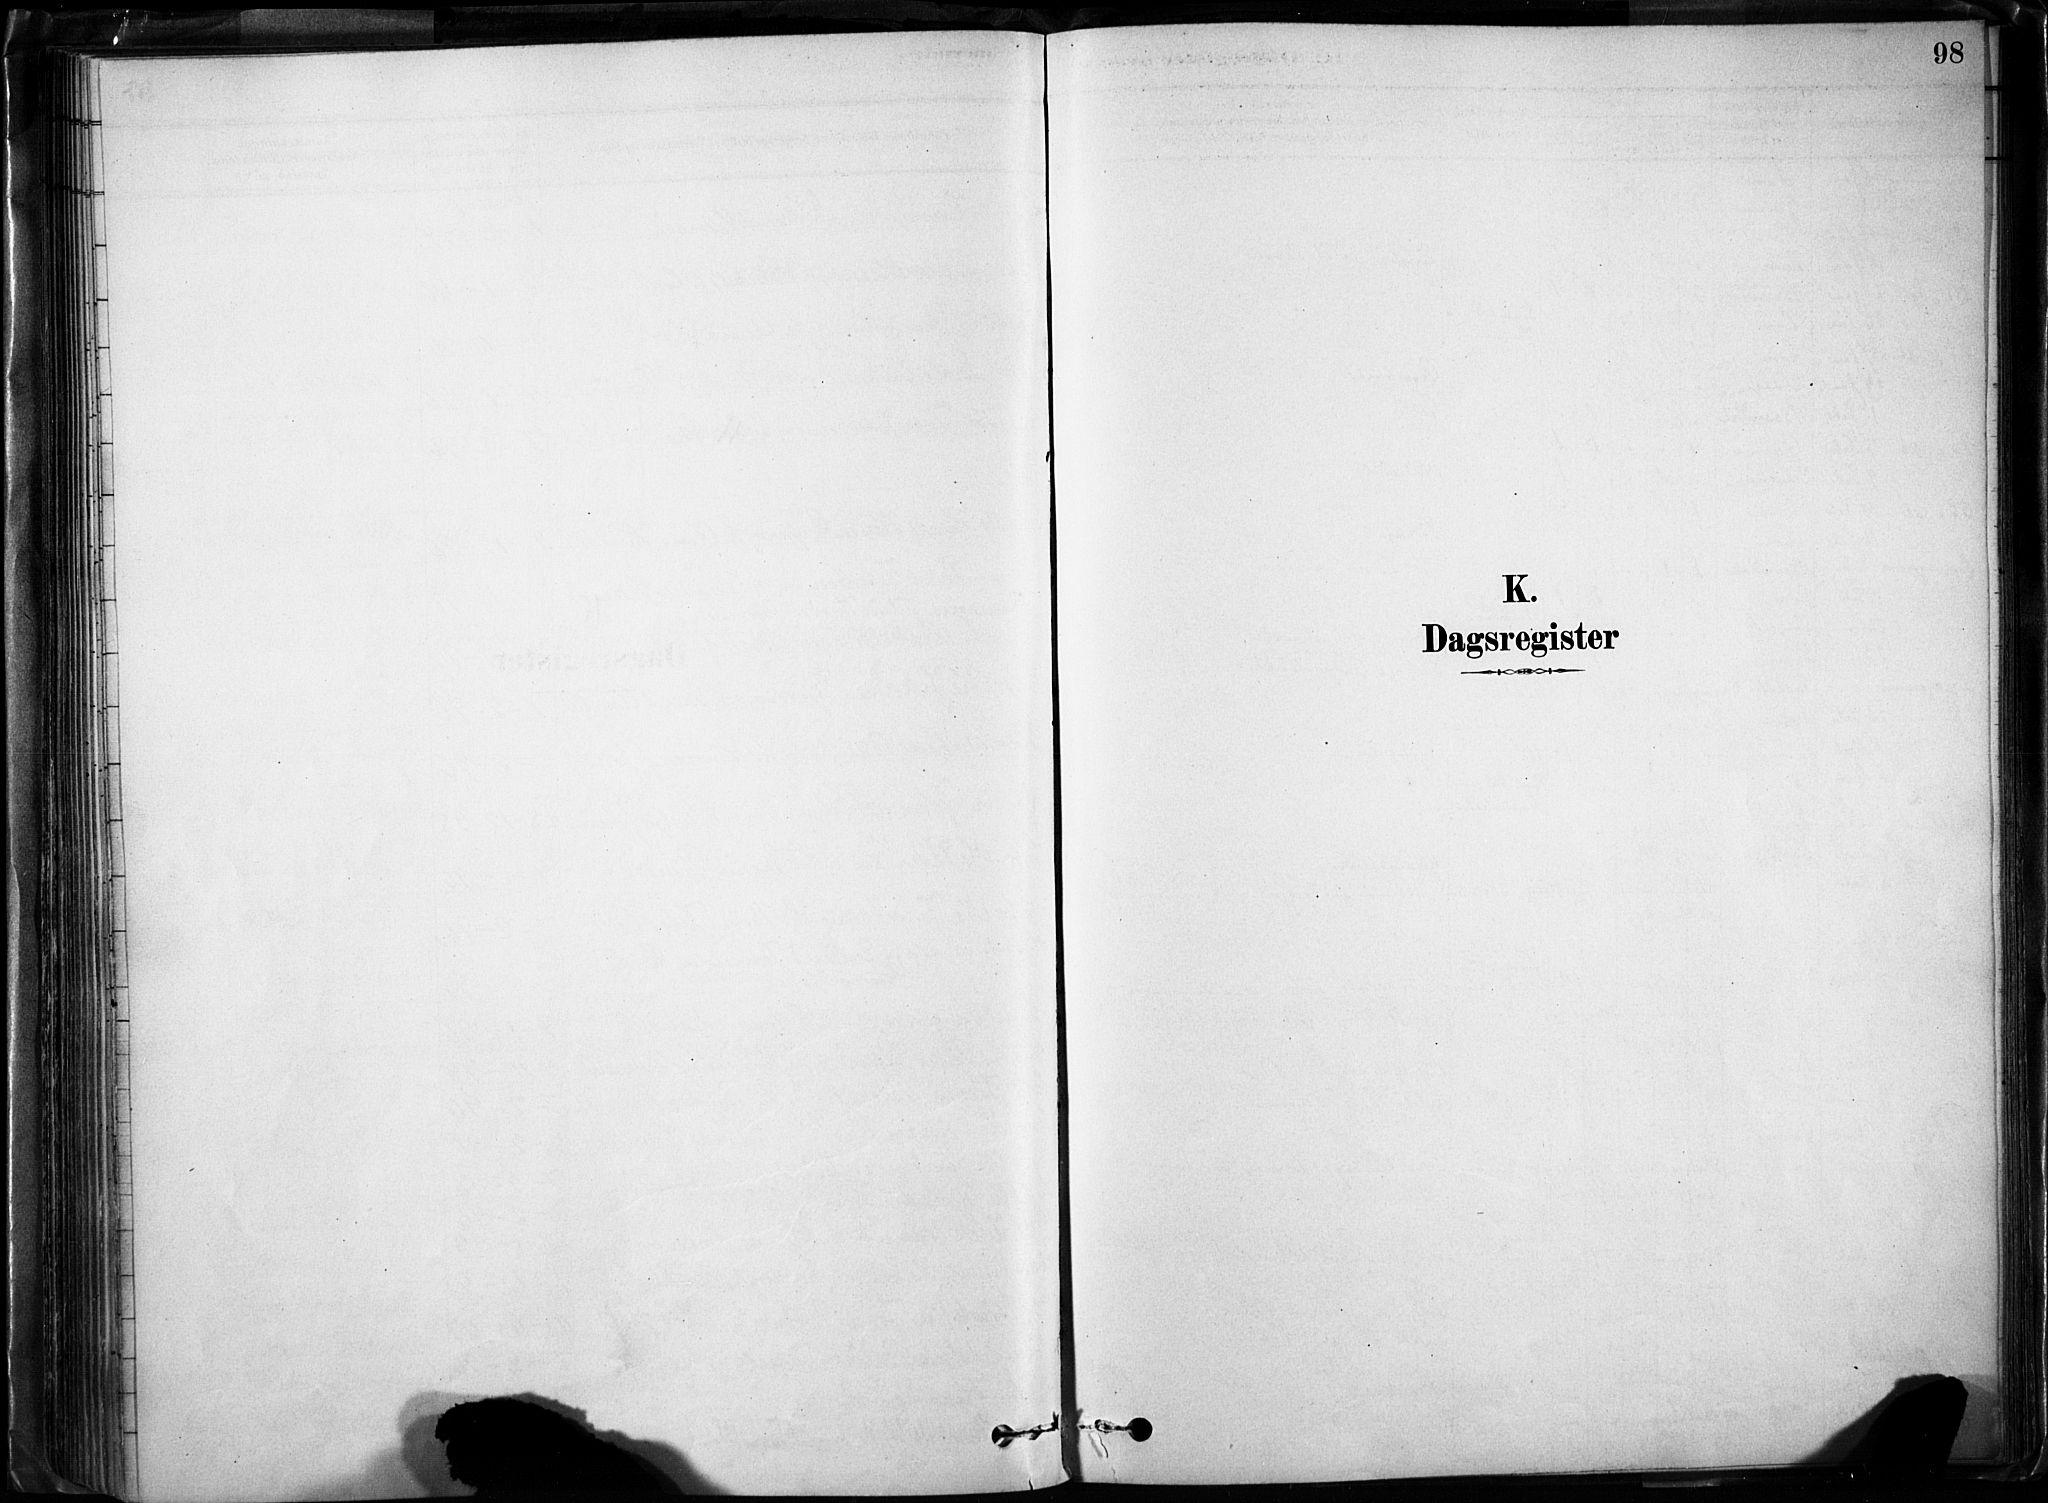 SAH, Lom prestekontor, K/L0009: Parish register (official) no. 9, 1878-1907, p. 98